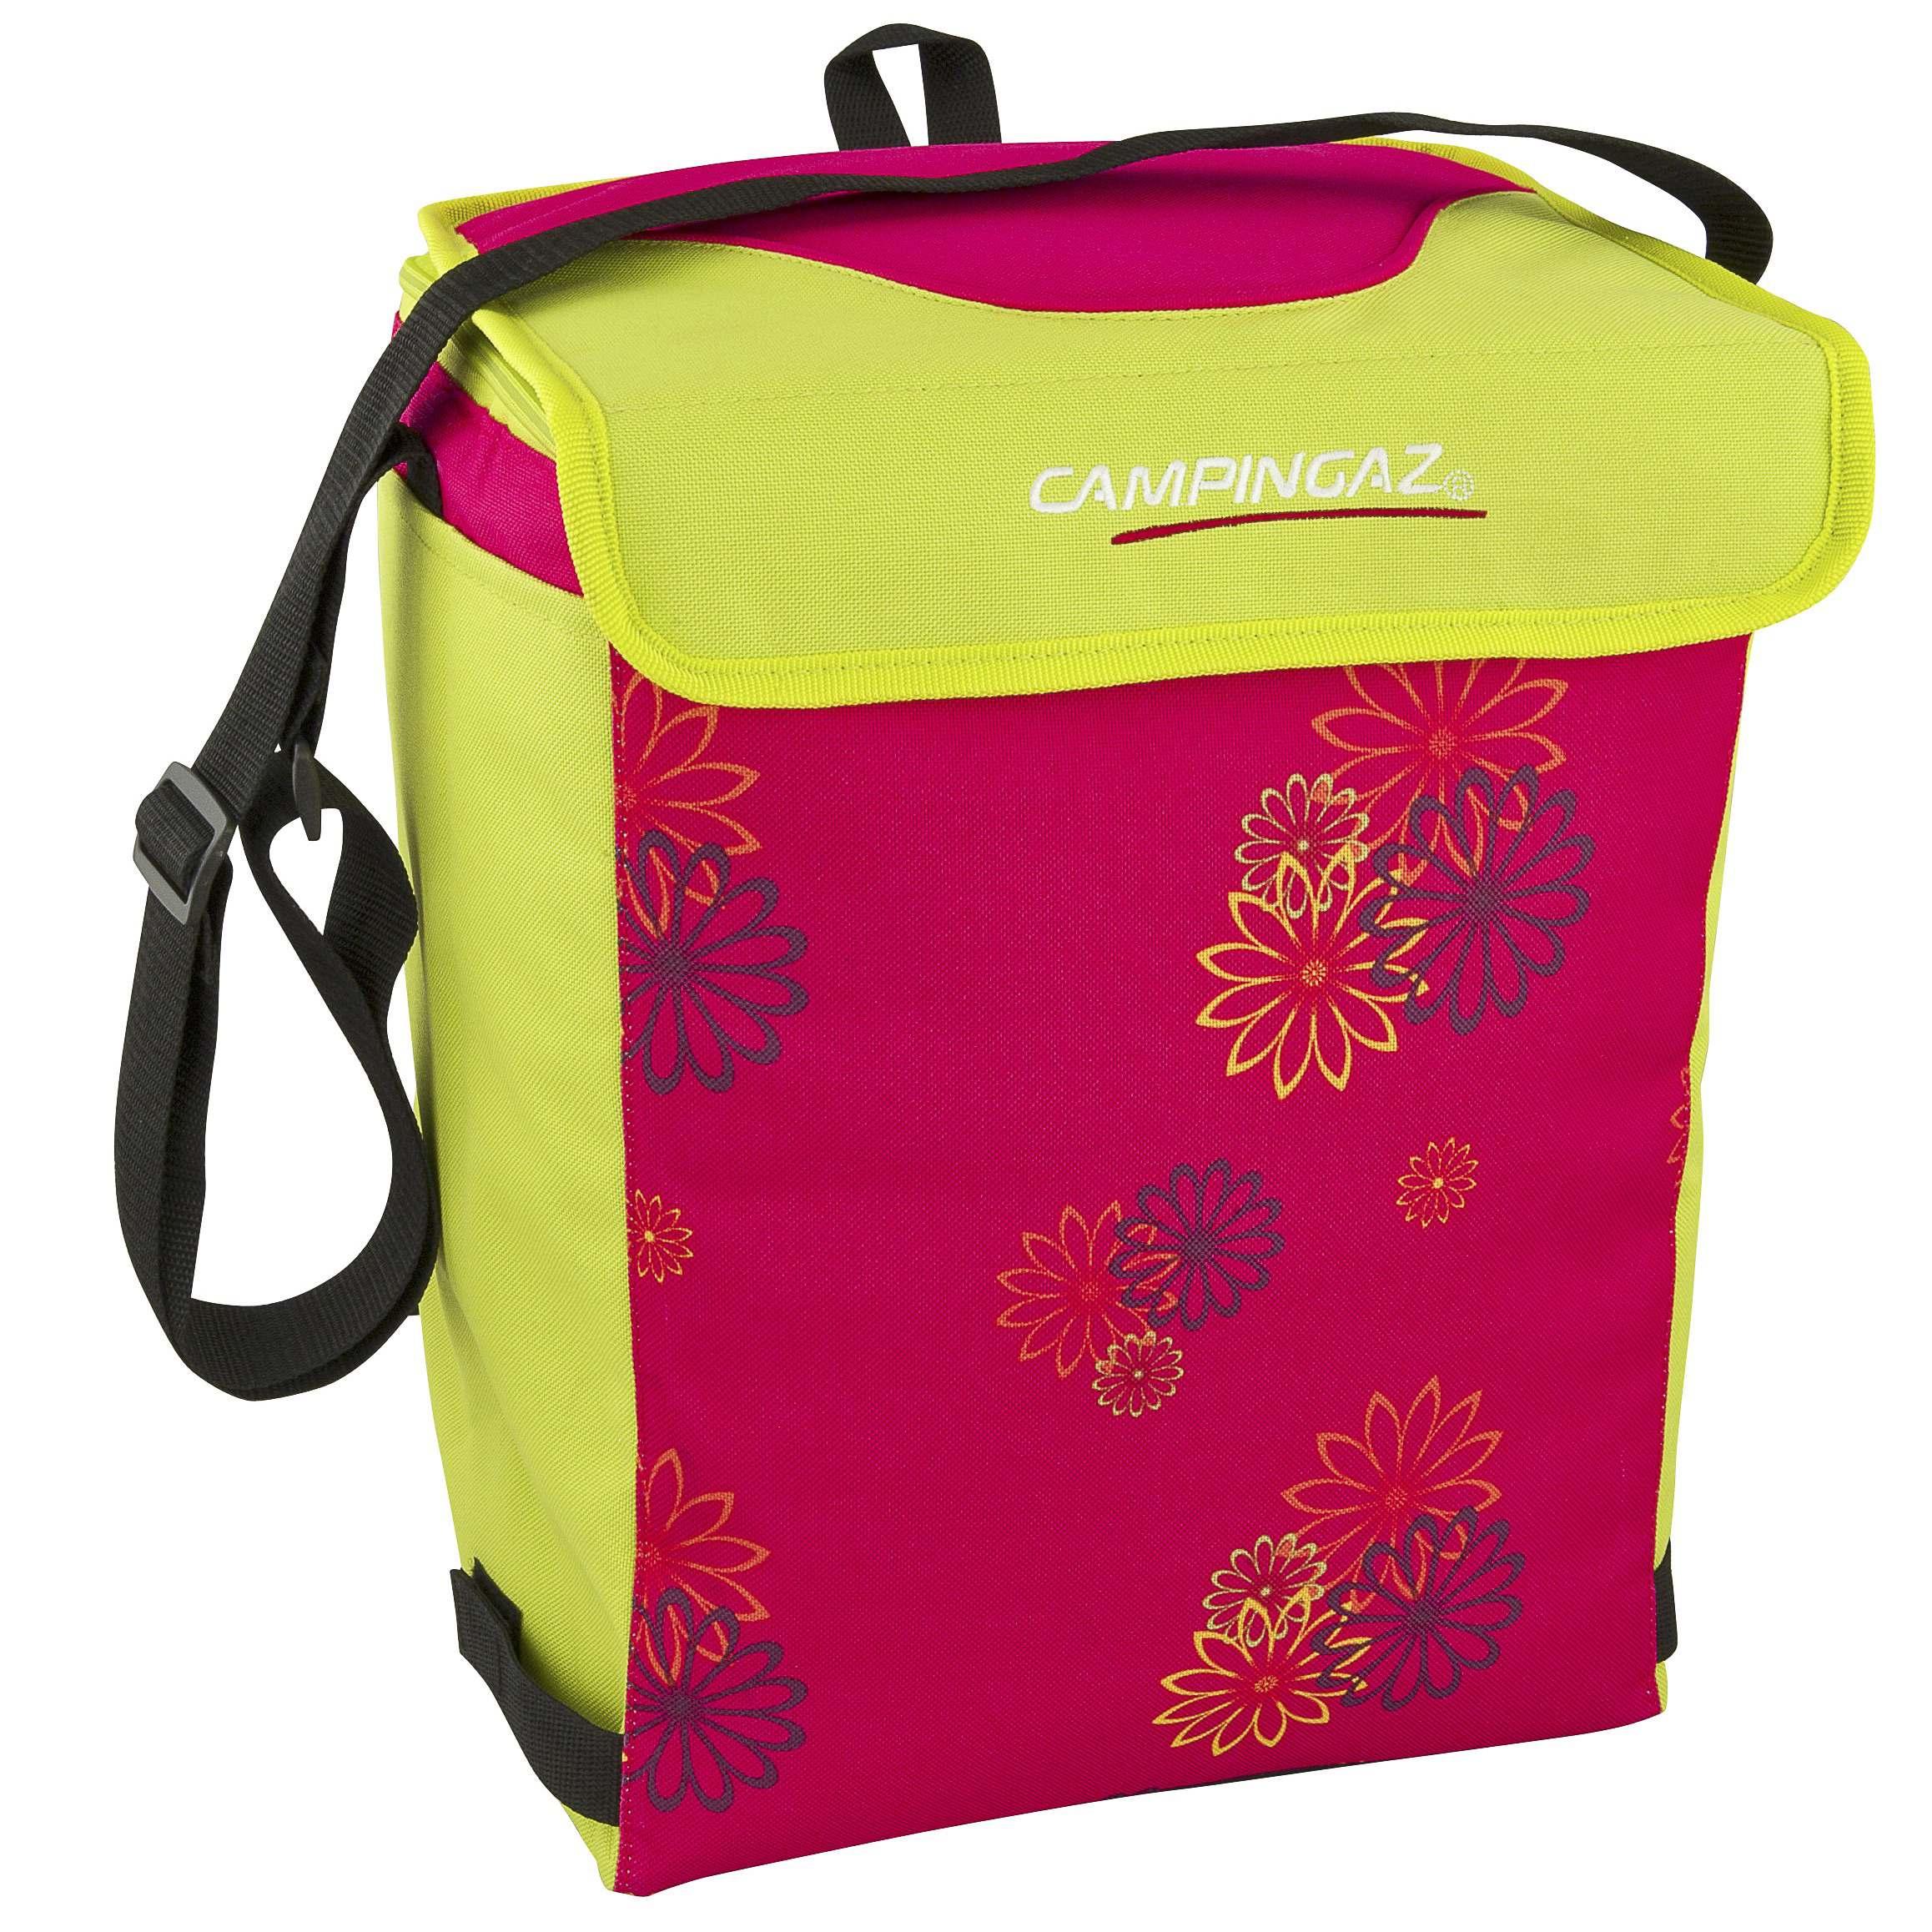 Campingaz Cooler 19 Liter Soft Cooler Bag Pink Daisy Cold